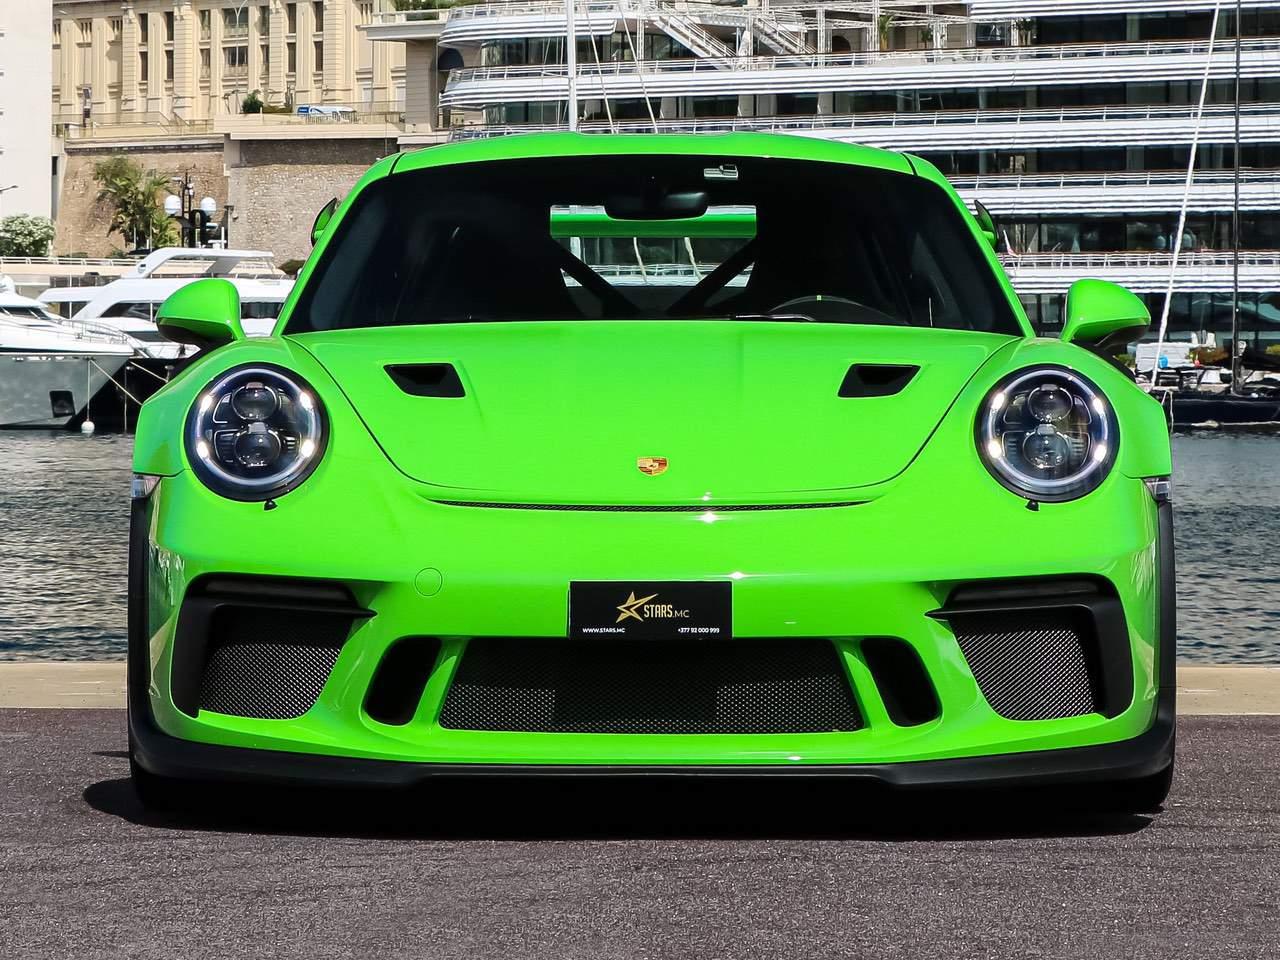 Porsche-911-Coupè-991-GT3-RS-PDK-4